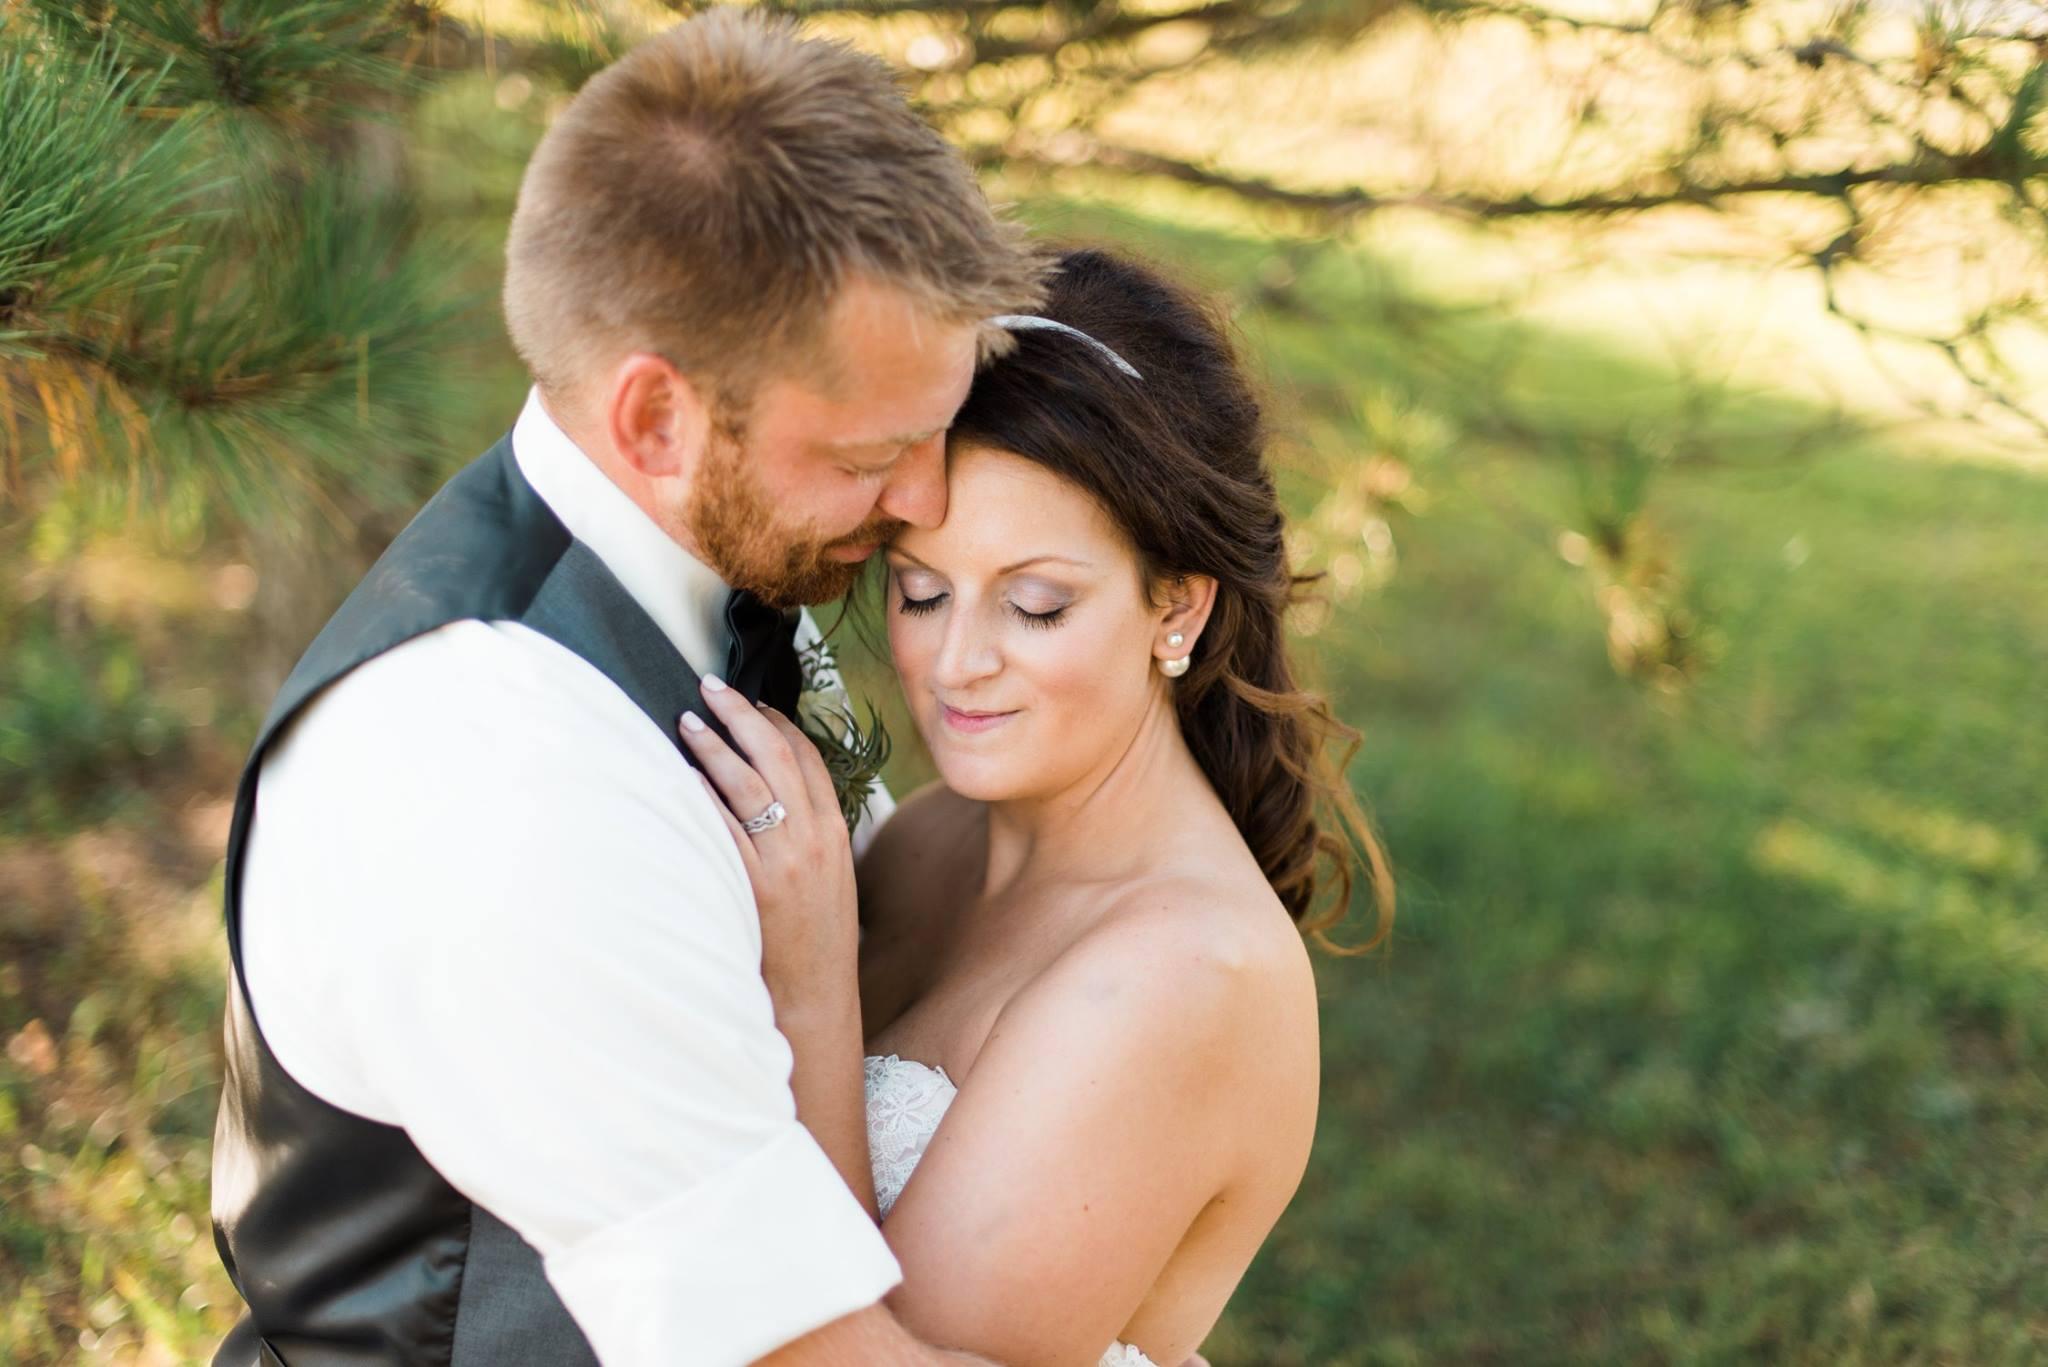 white-barn-pennsylvania-wedding-glam-rustic-farm-0021.jpg